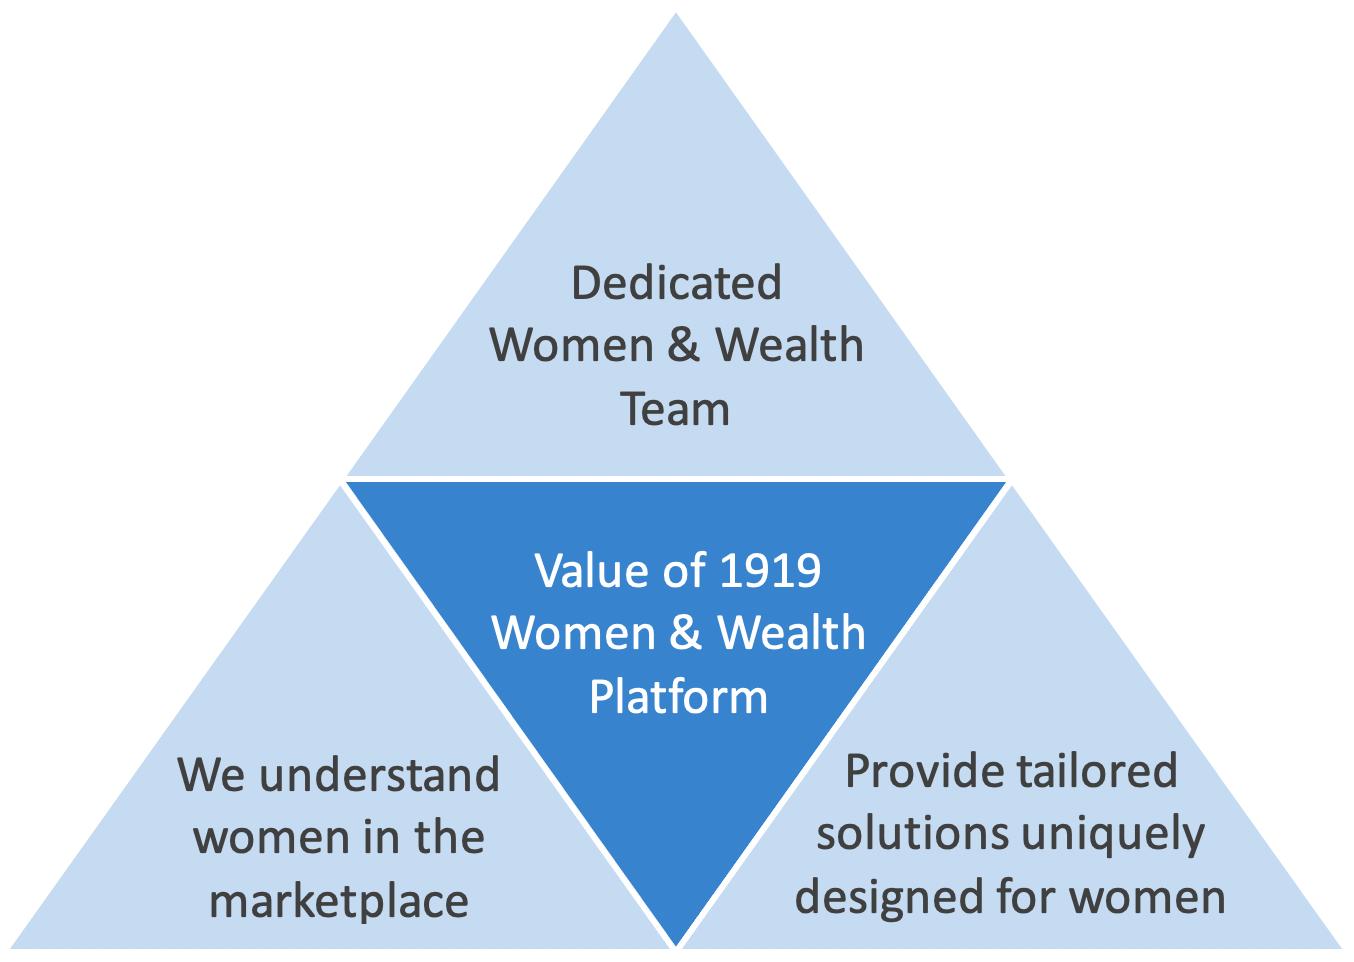 Value of 1919 Women & Wealth Platform